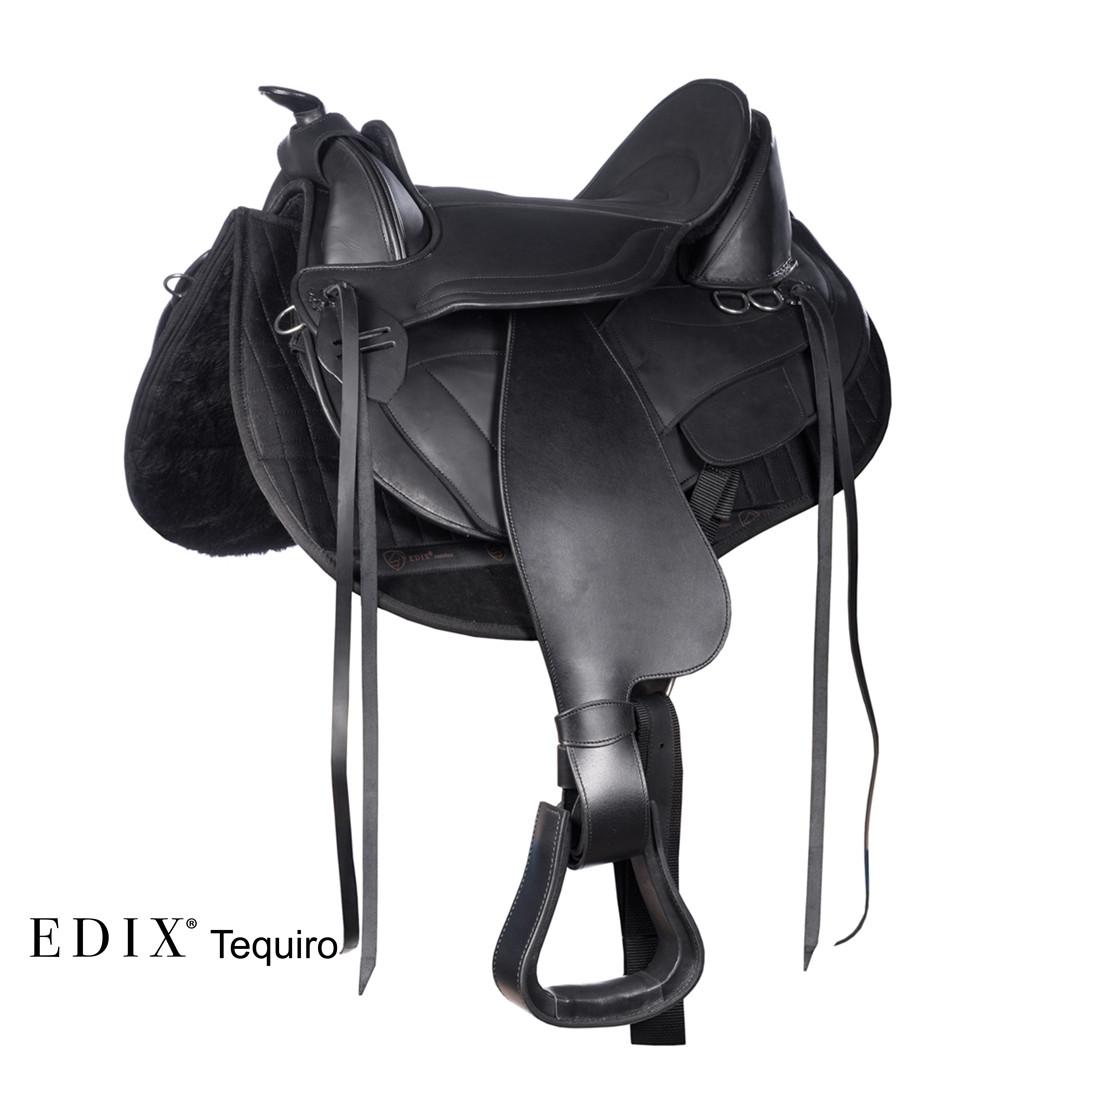 EDIX® Tequiro (complete set zwart)